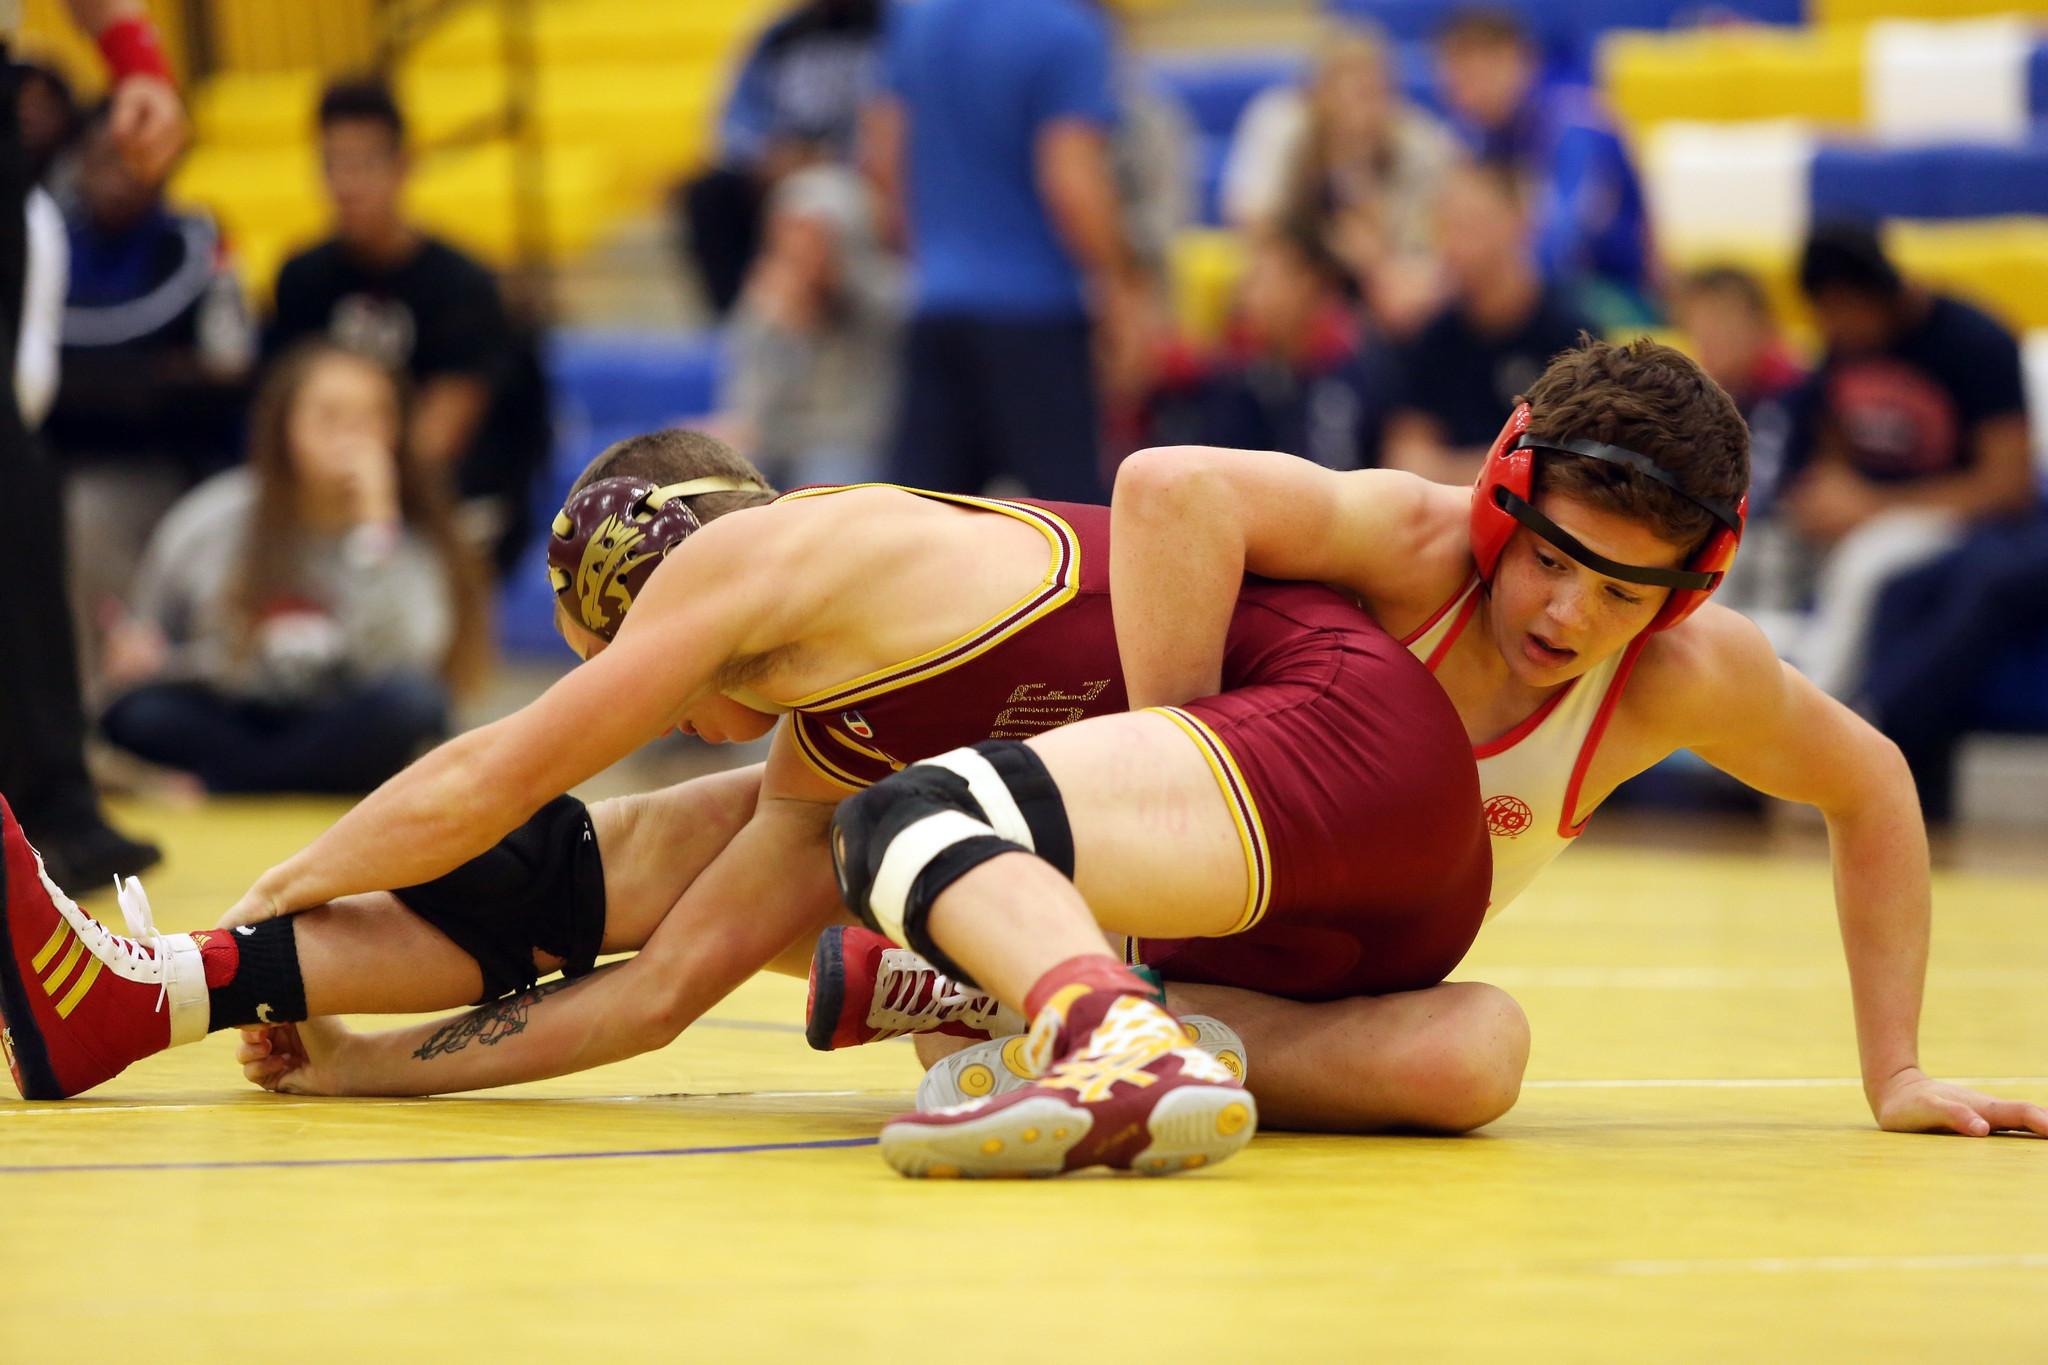 ncs wrestling dual meet 2016